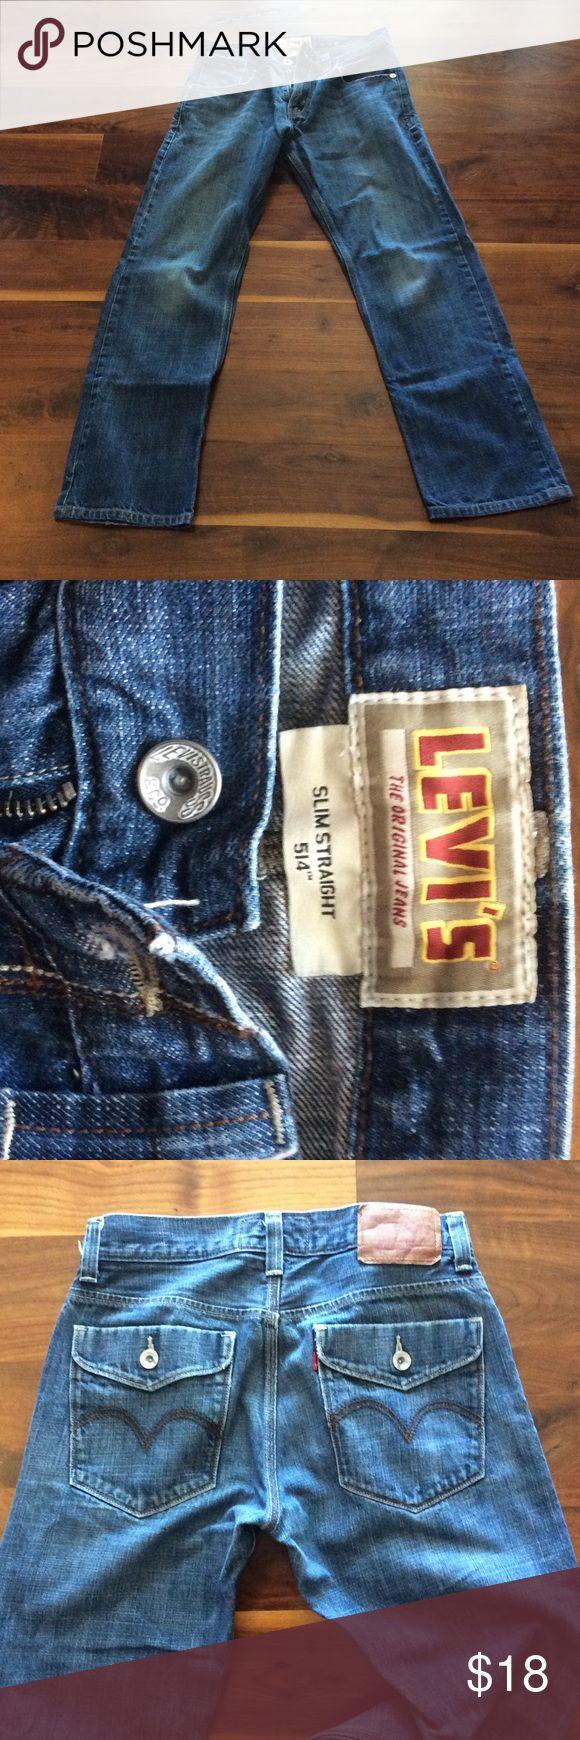 Levi jeans Levi 514 jeans size 32 X 34.  Gently worn. Levi's Jeans Slim Straight